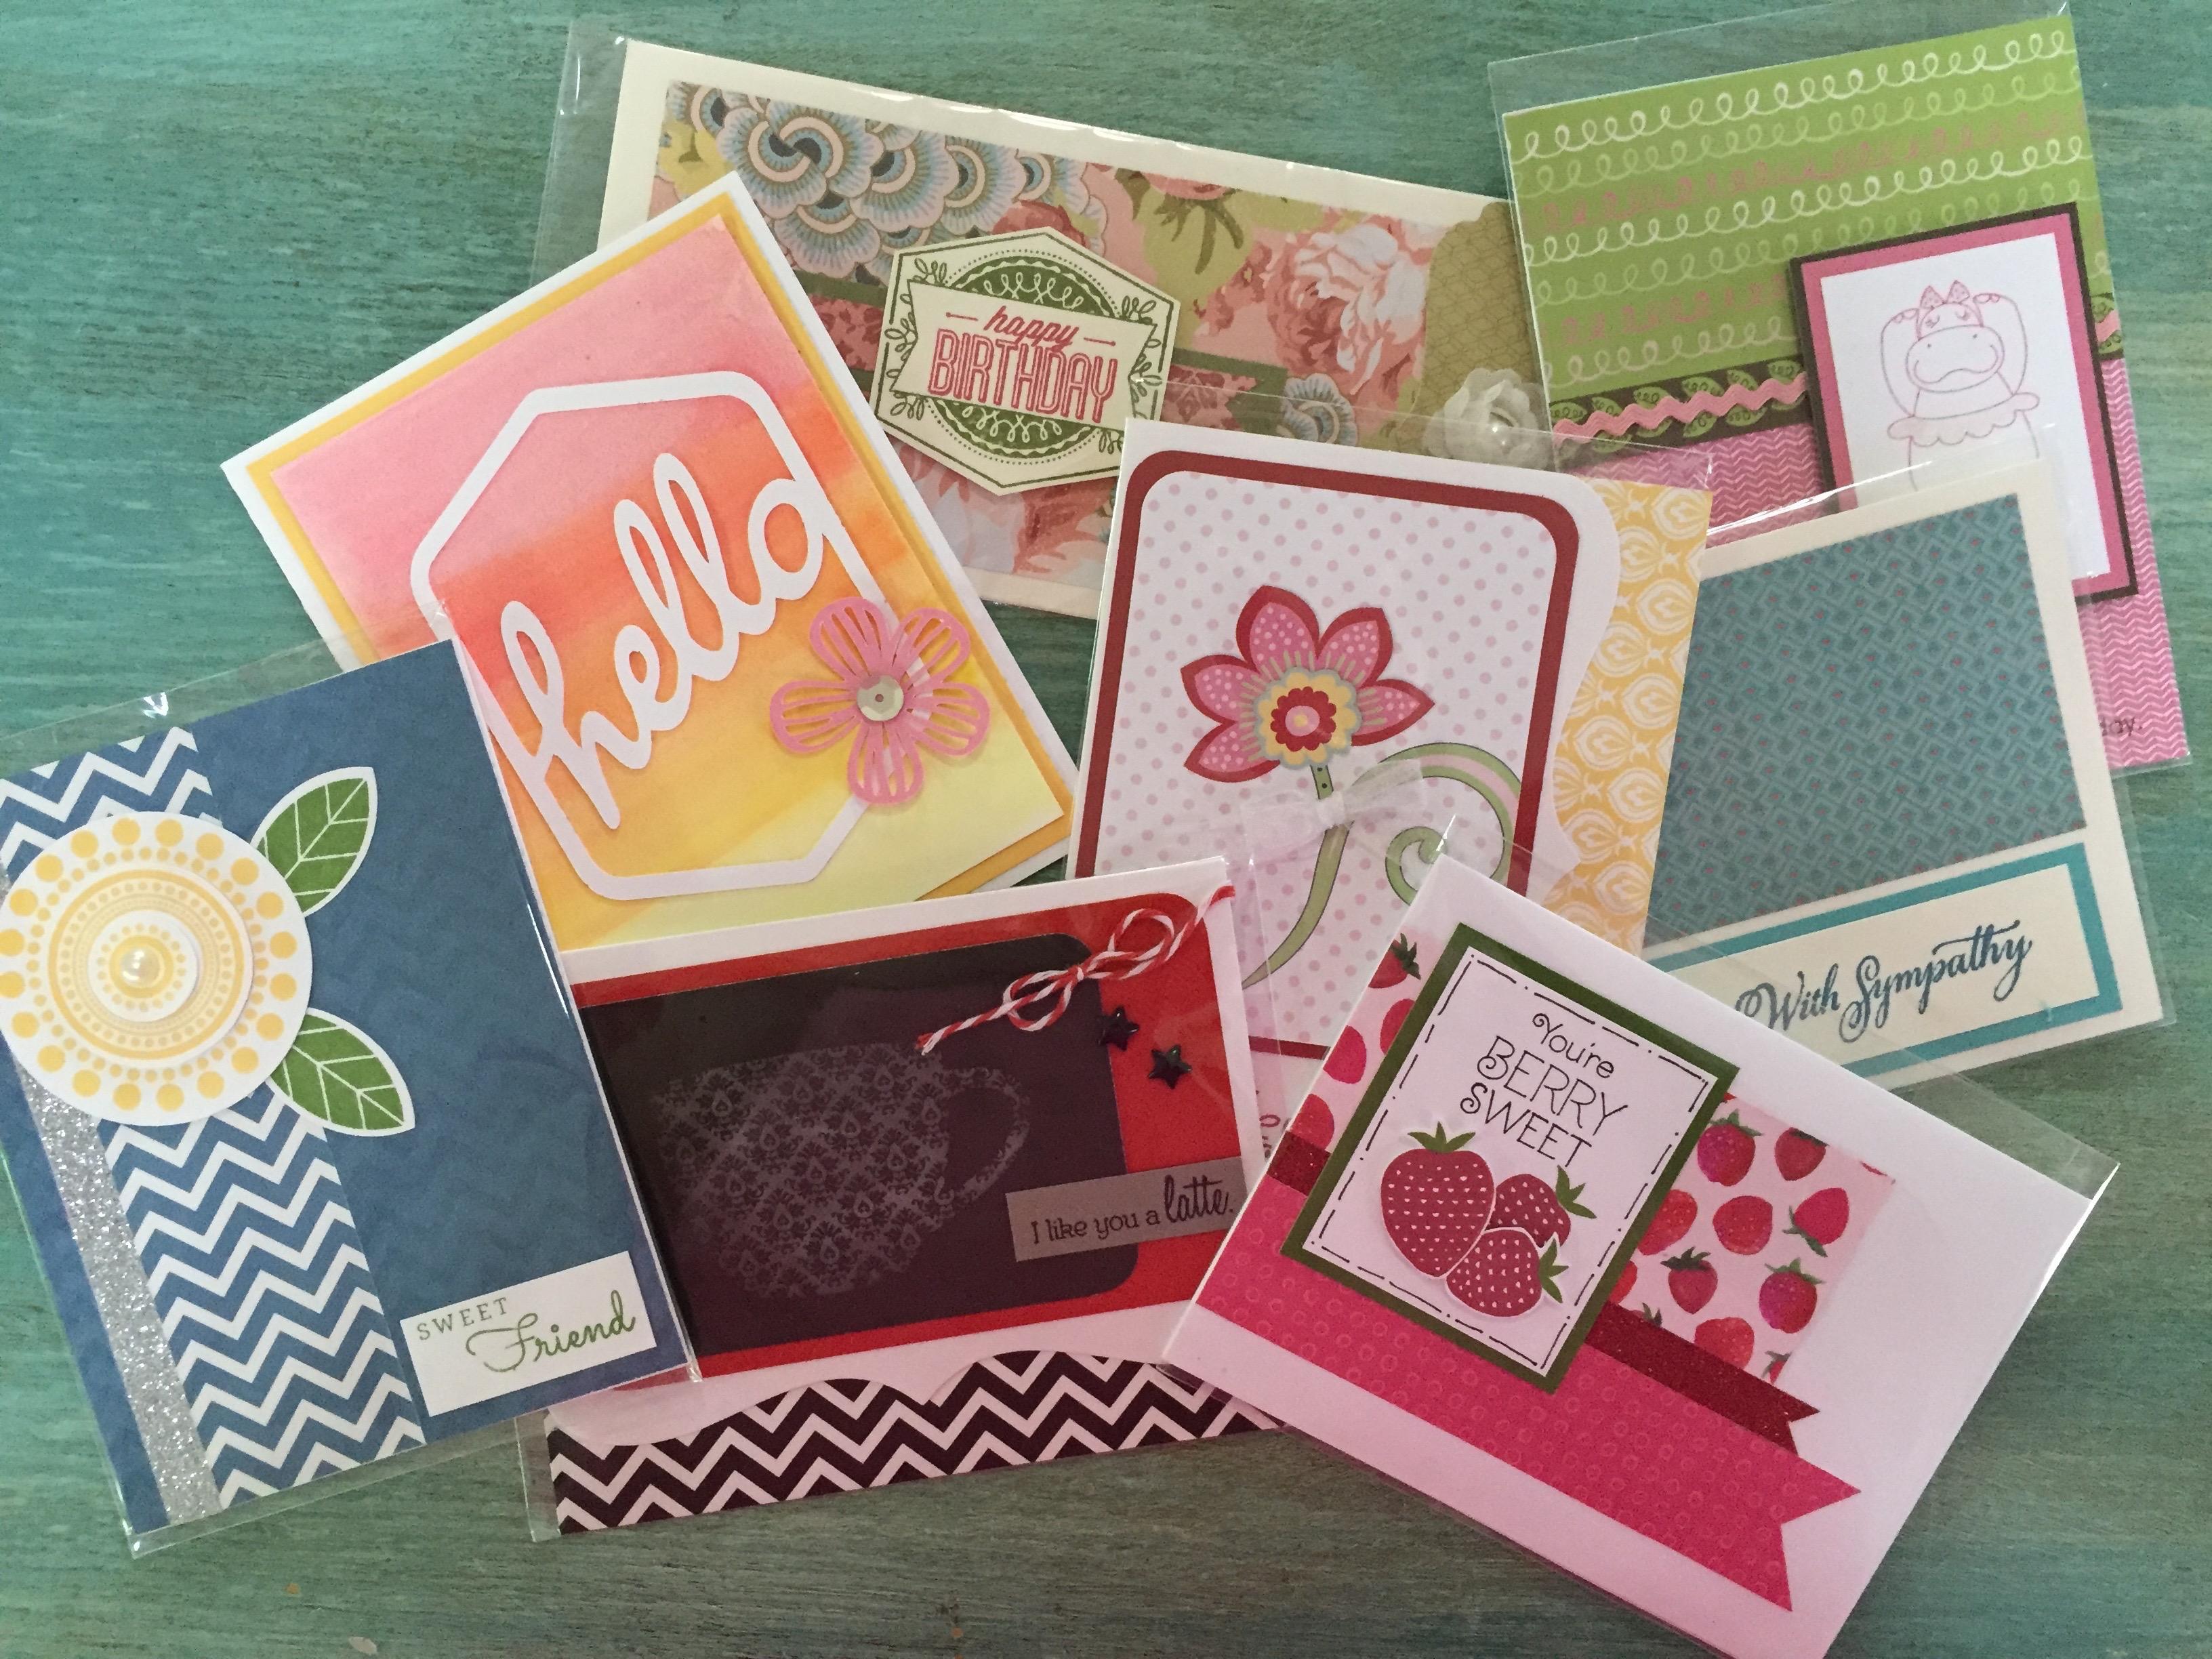 Have fun at my Card Buffet this week!